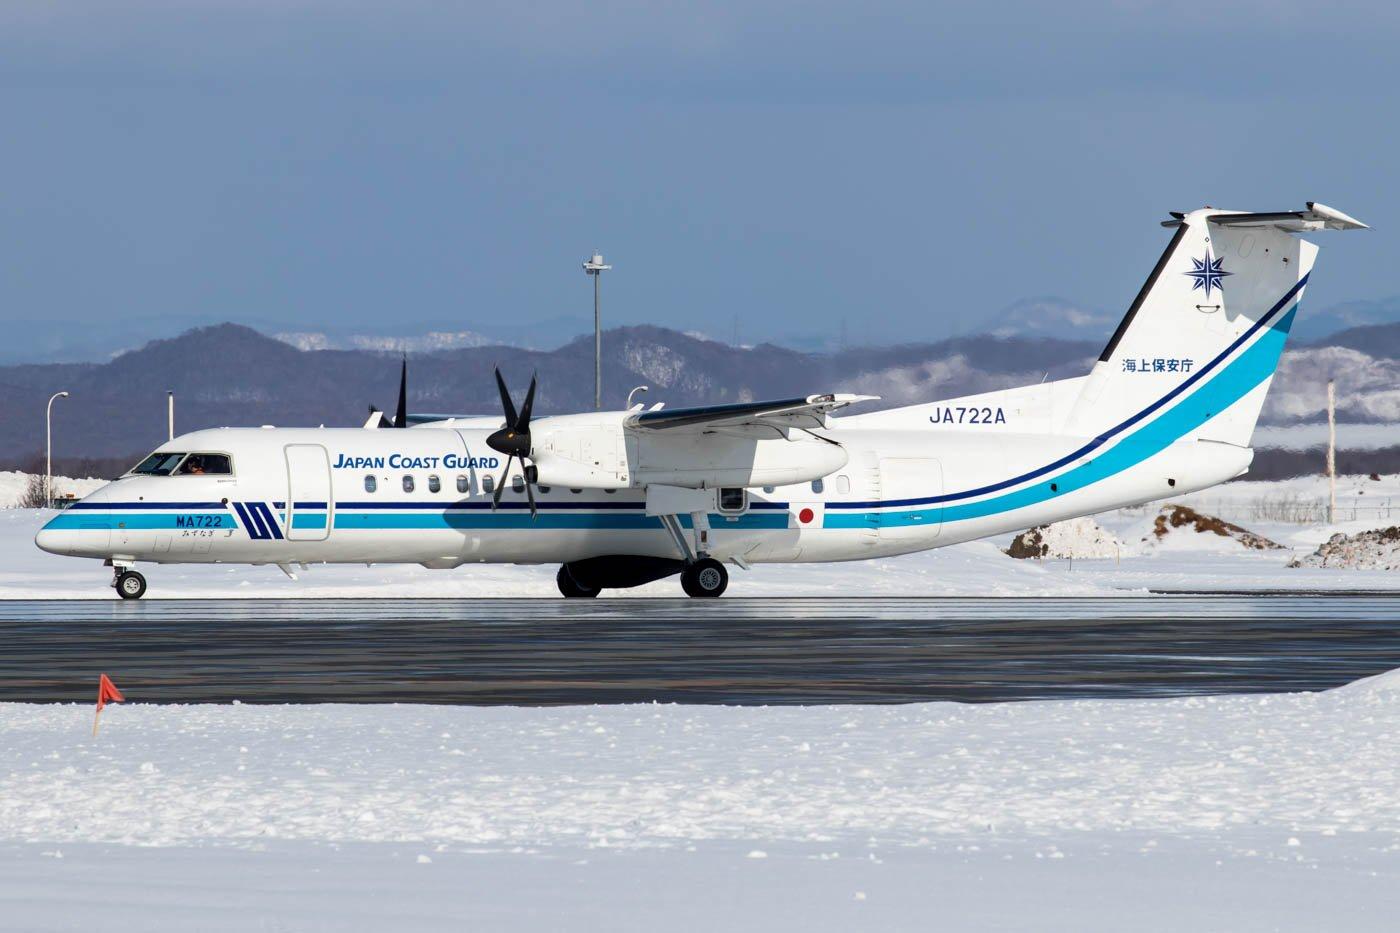 Japan Coast Guard DHC-8-300 Departing Chitose Airbase